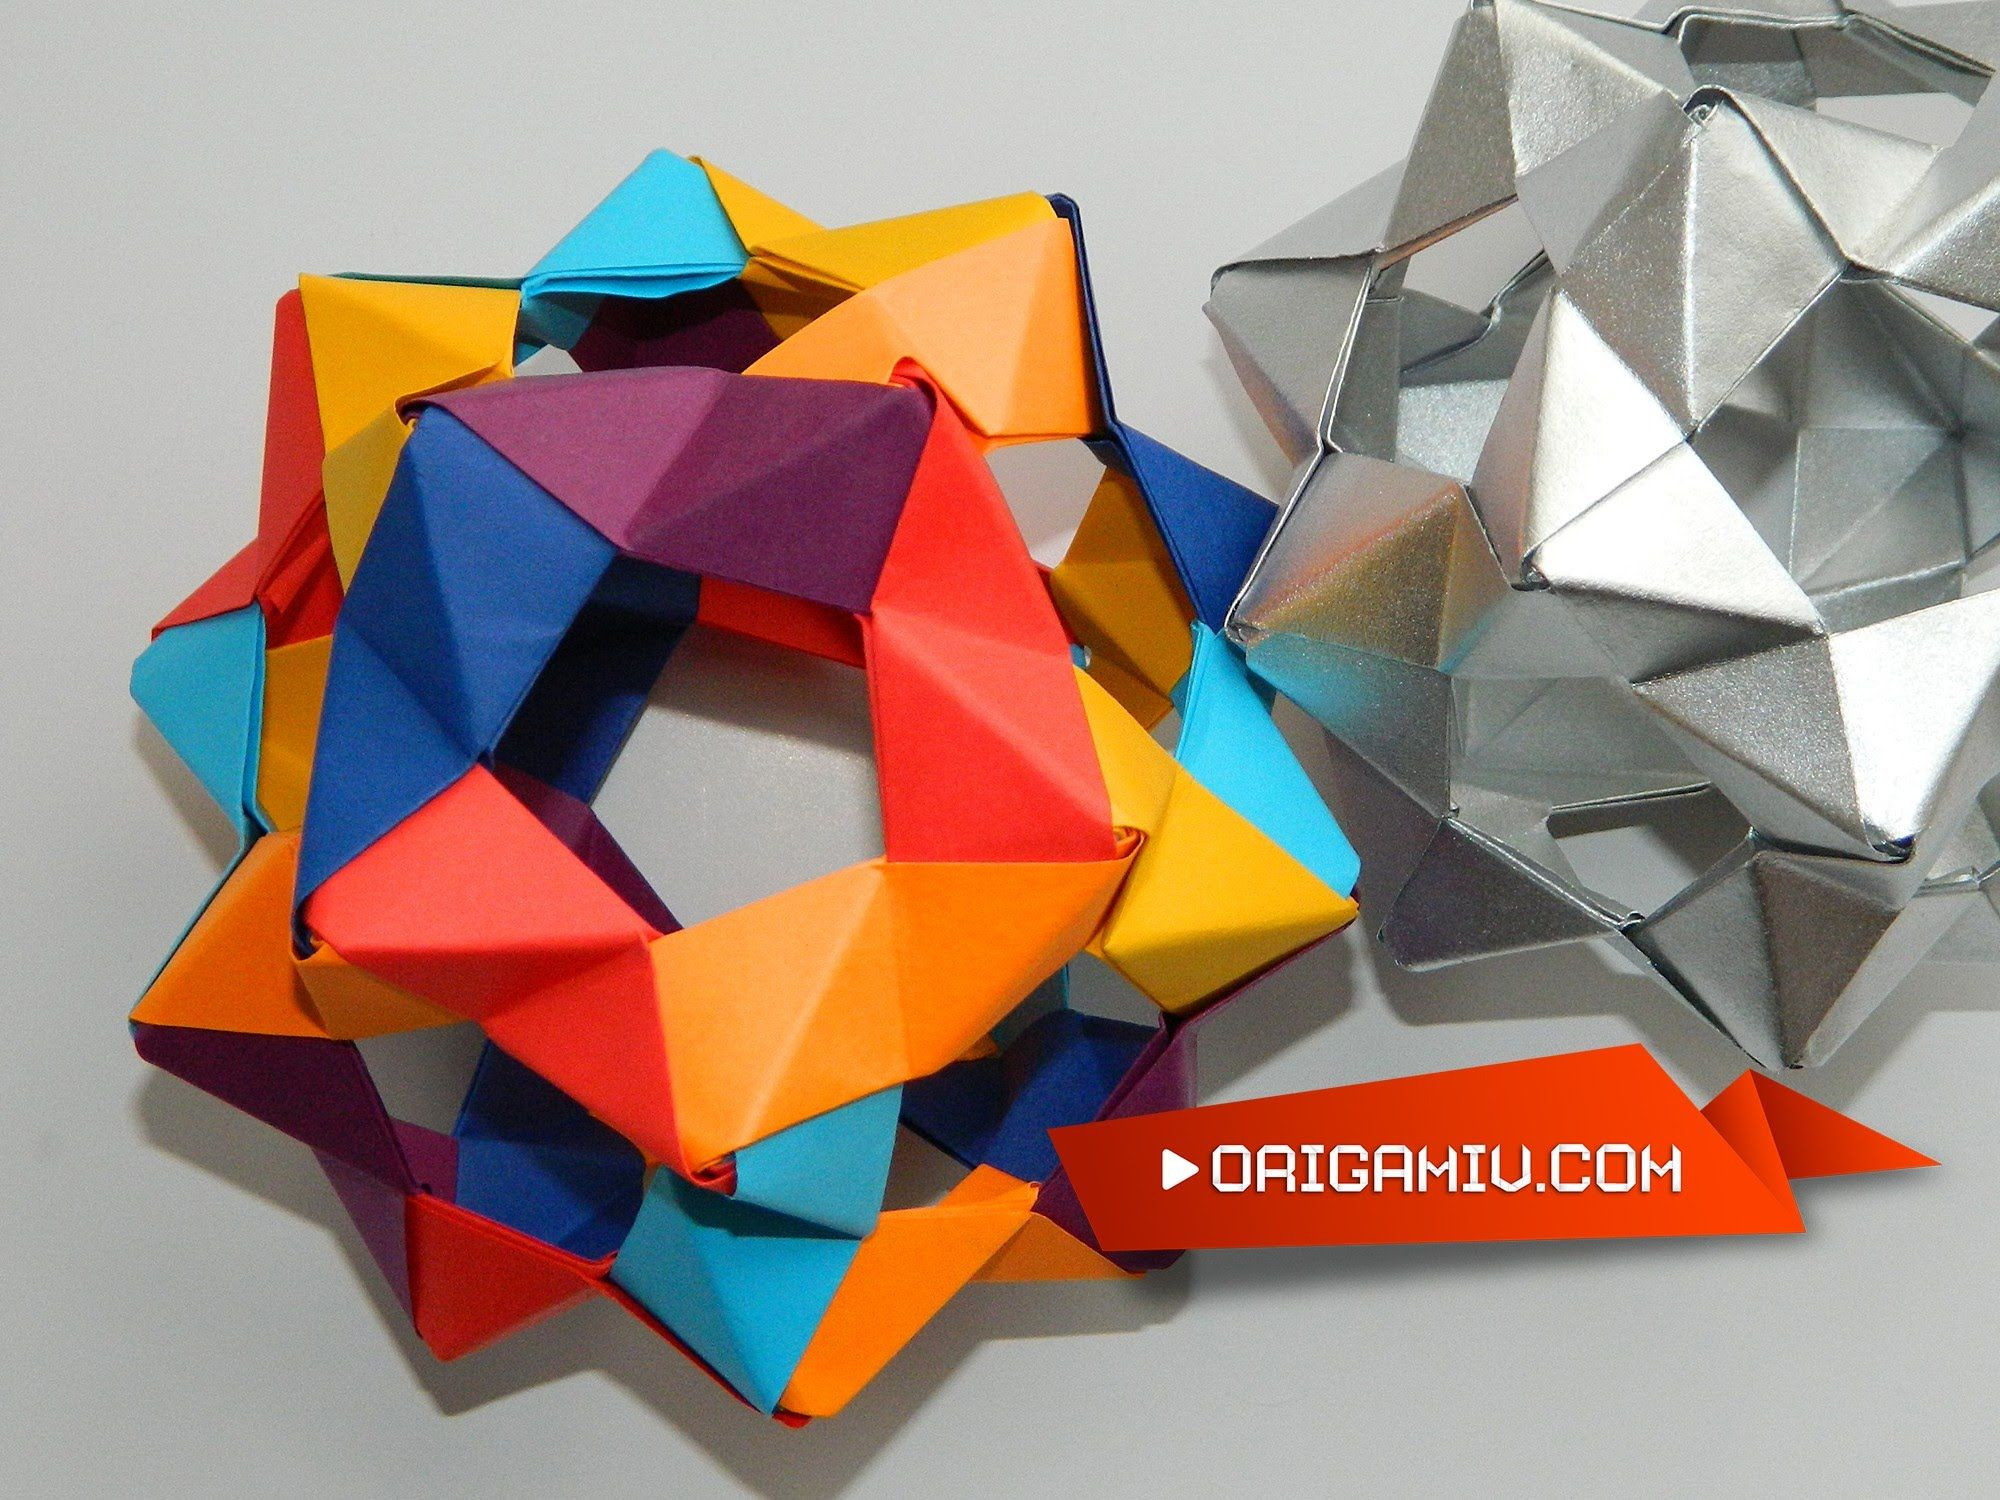 Cube 12 Units Origami Kusudama Recherche Google Origami Diagrams